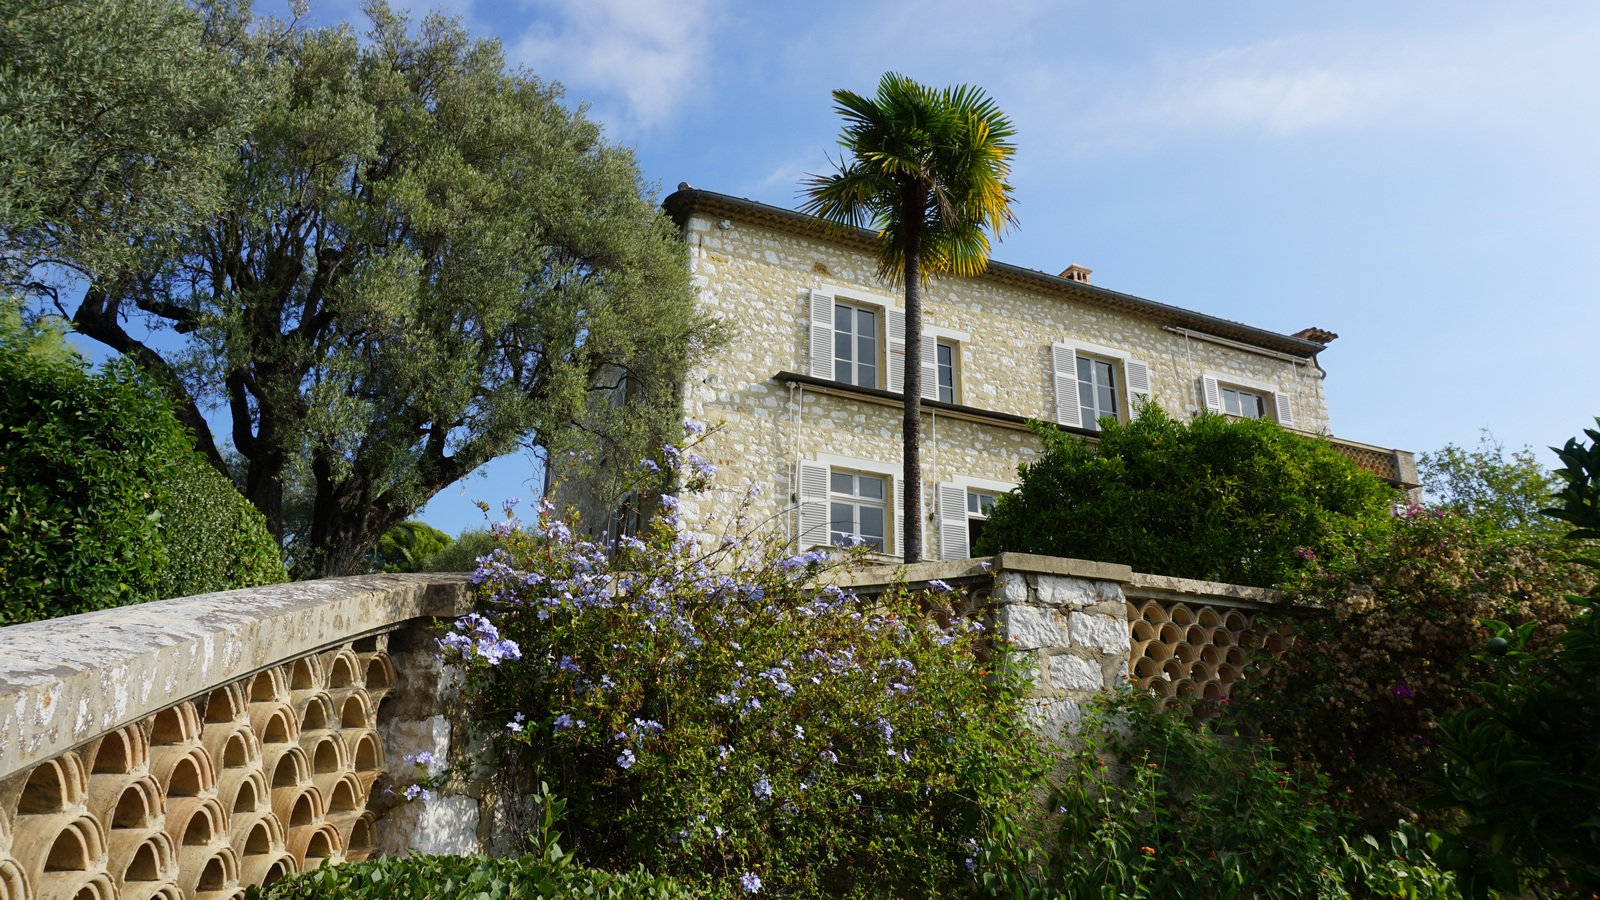 Renoir-museum-in-Cagnes-sur-Mer